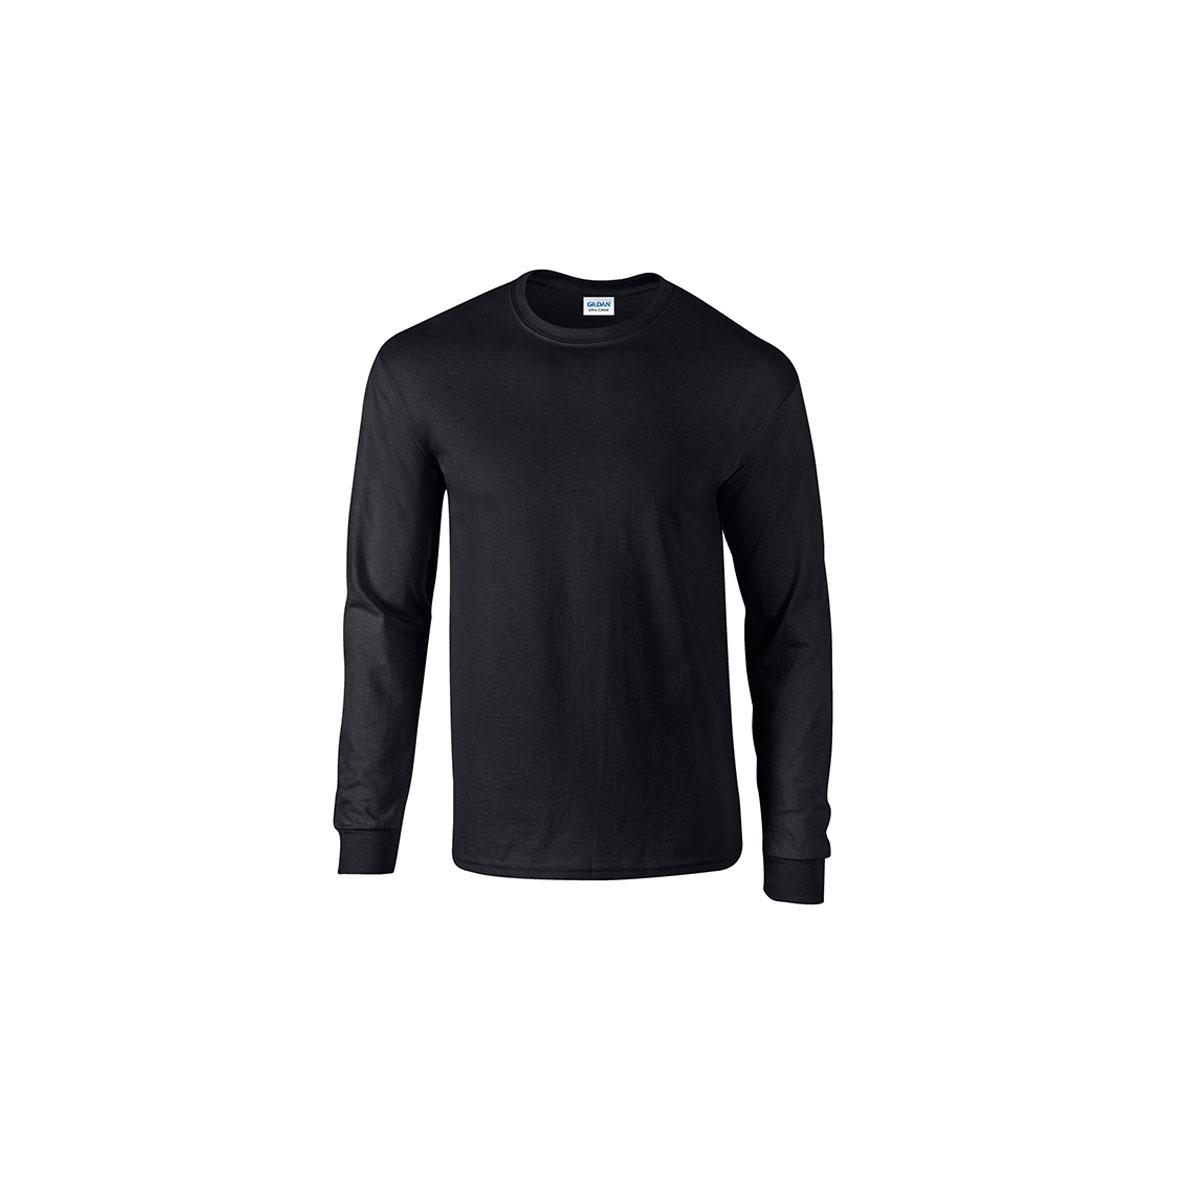 Long sleeve custom tshirts custom clothing for Personalized long sleeve t shirts